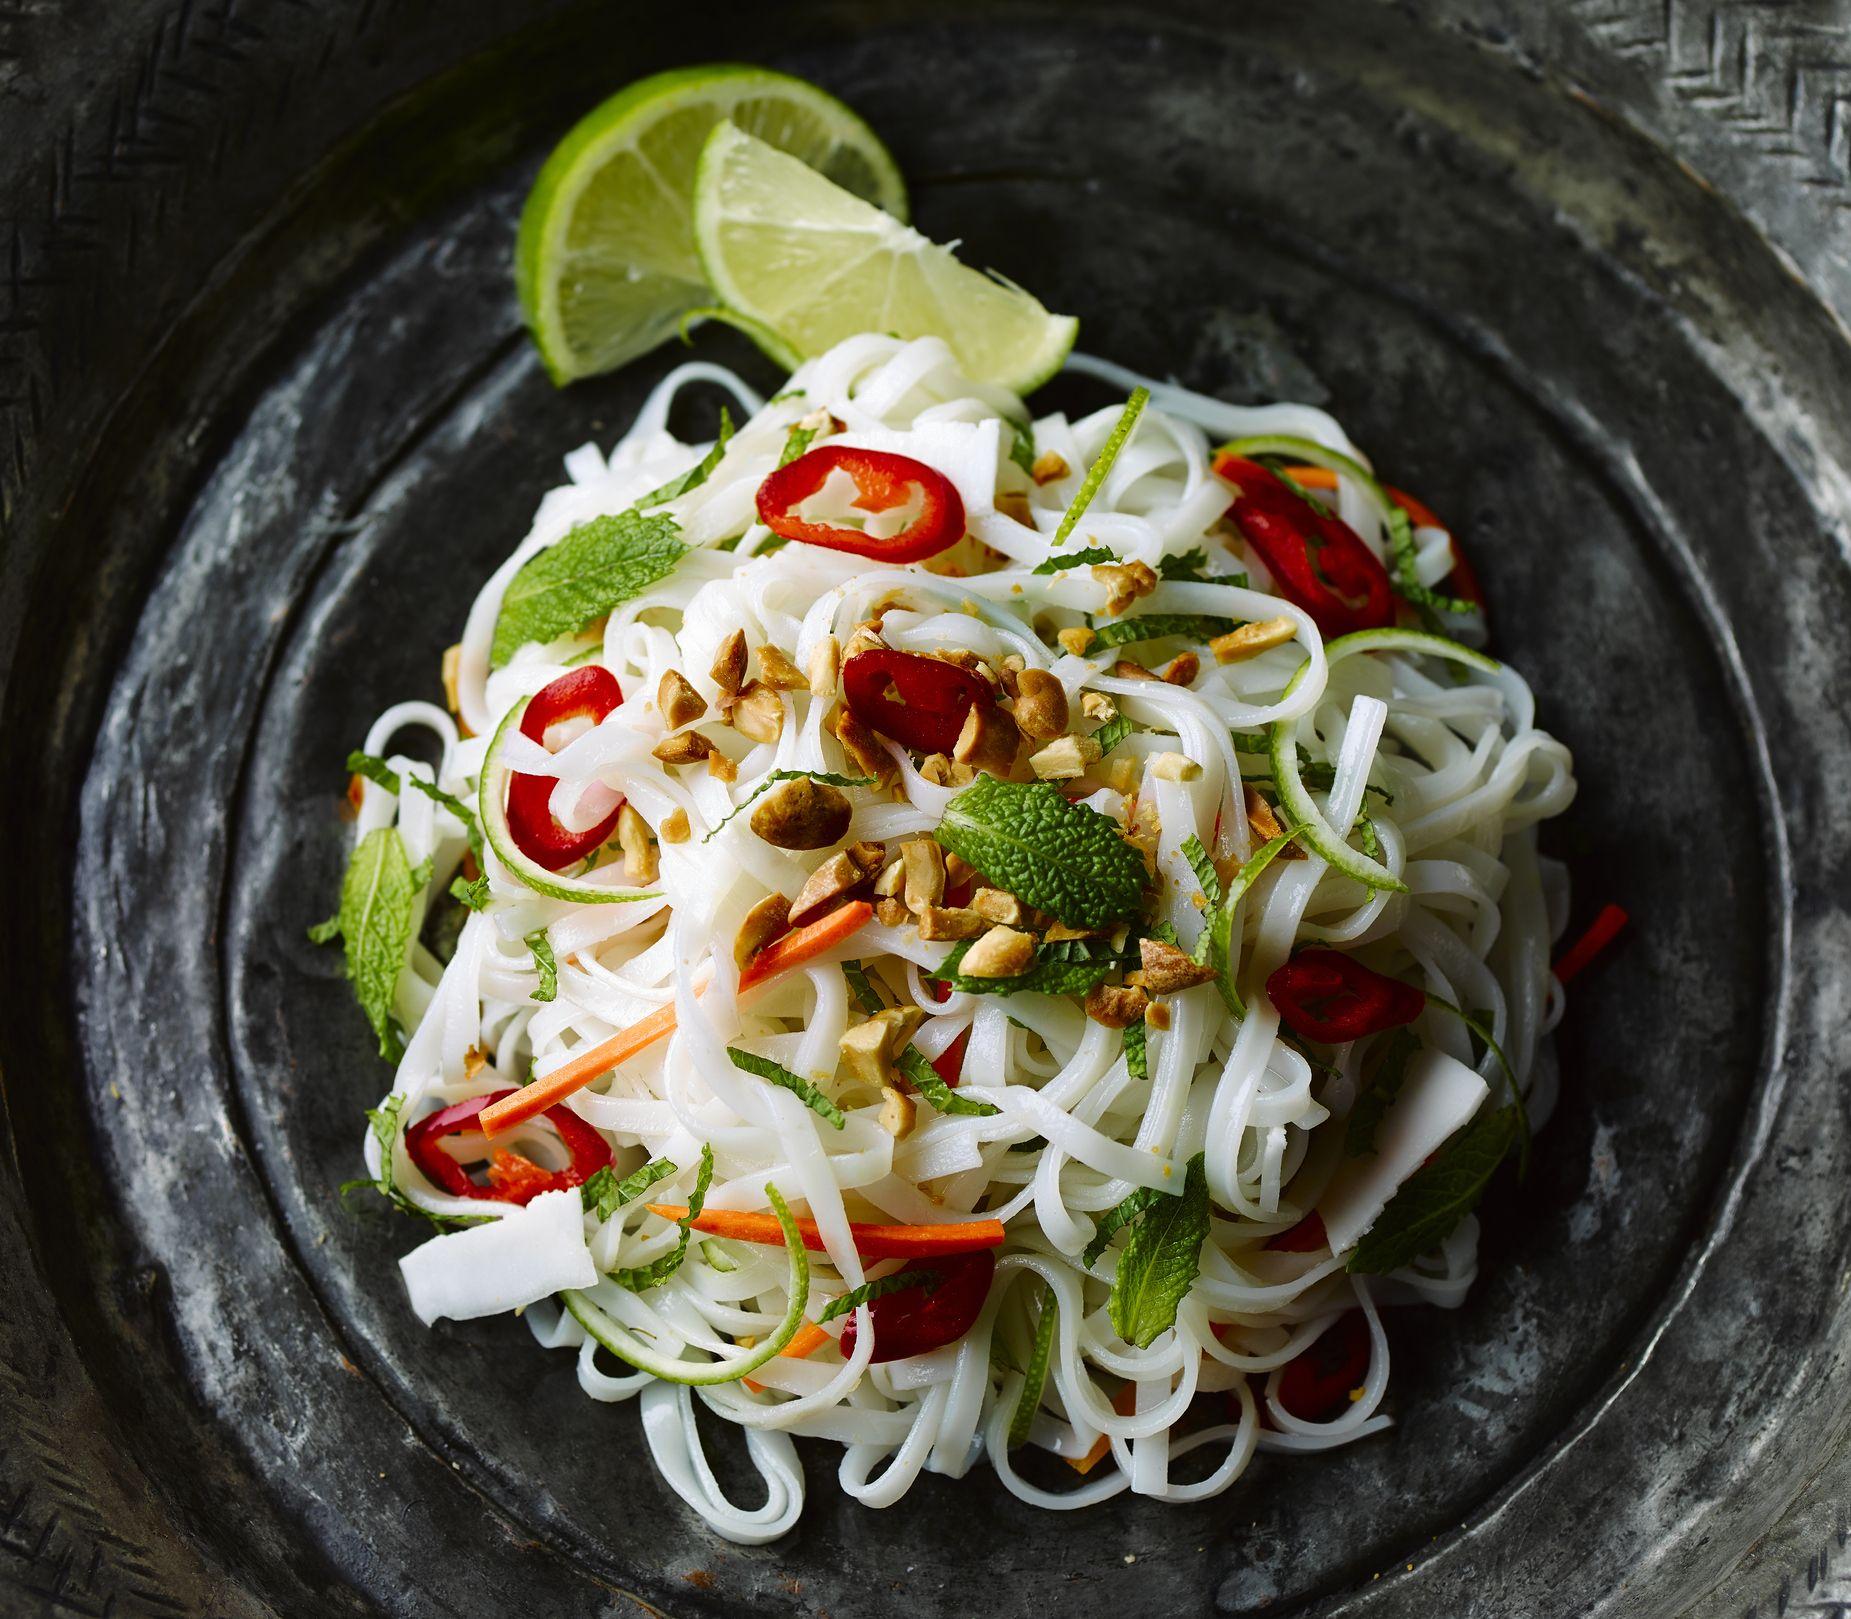 Thai hot and sour salad with crispy tofu